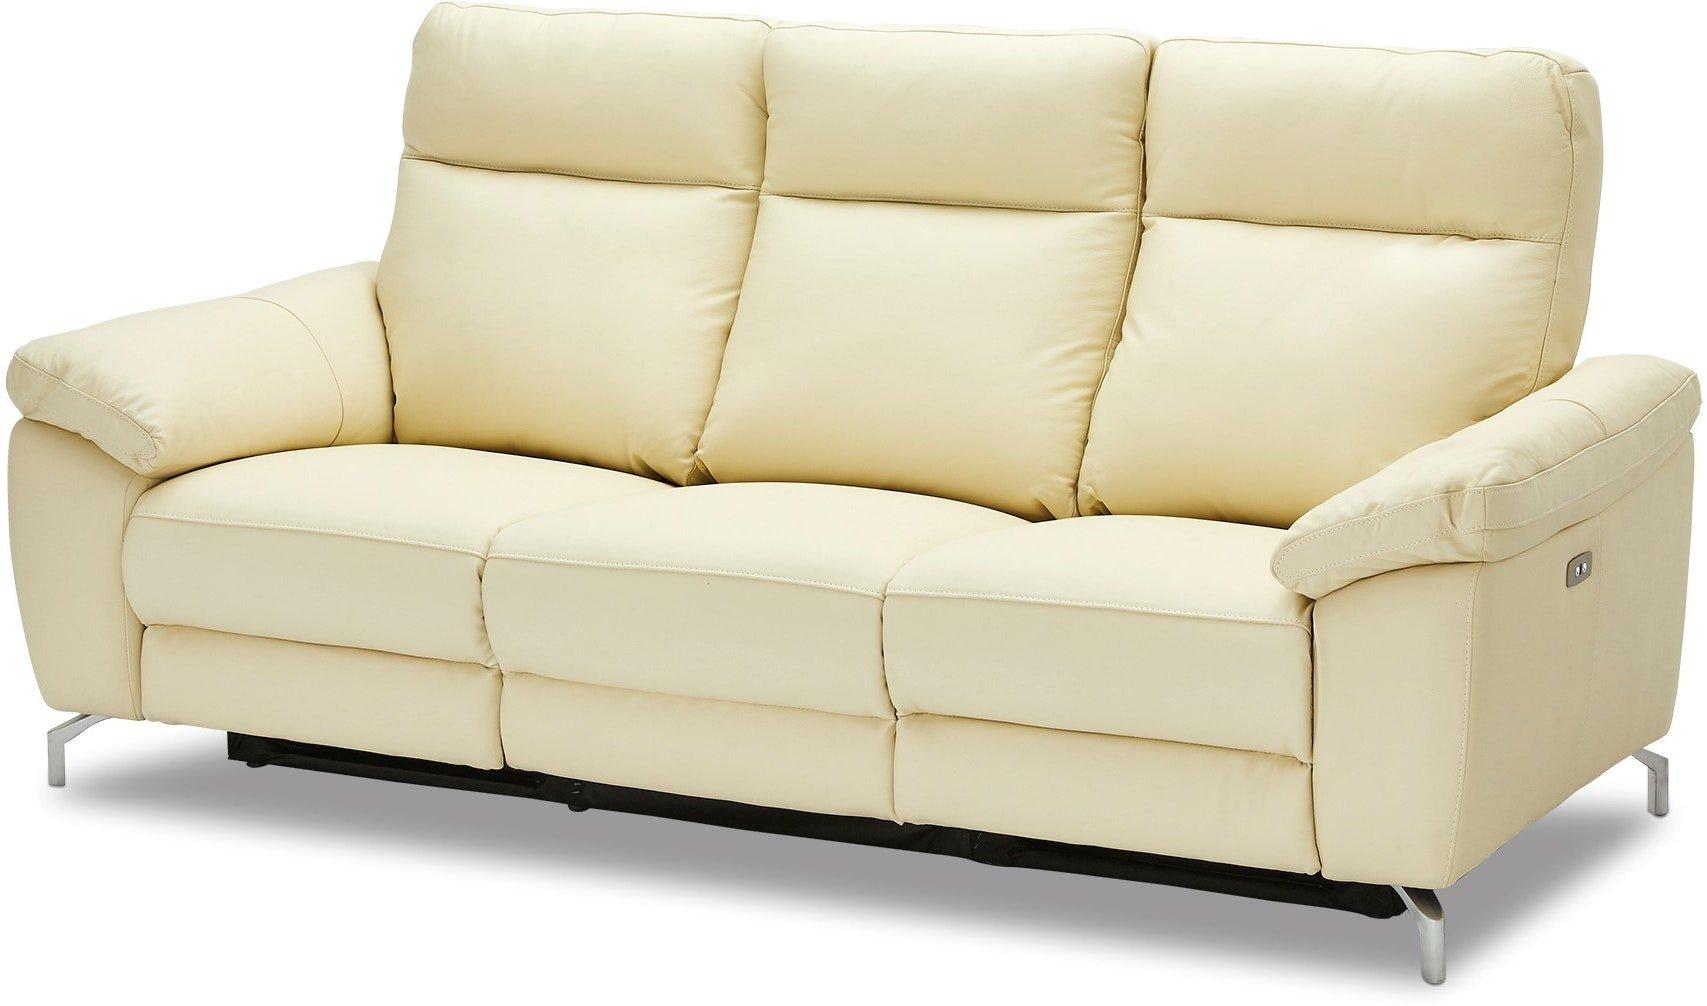 St. Amble, 2-personers sofa, Ægte læder by Raymond & Hallmark (H: 101 cm. B: 222 cm. L: 96 cm., Cream)